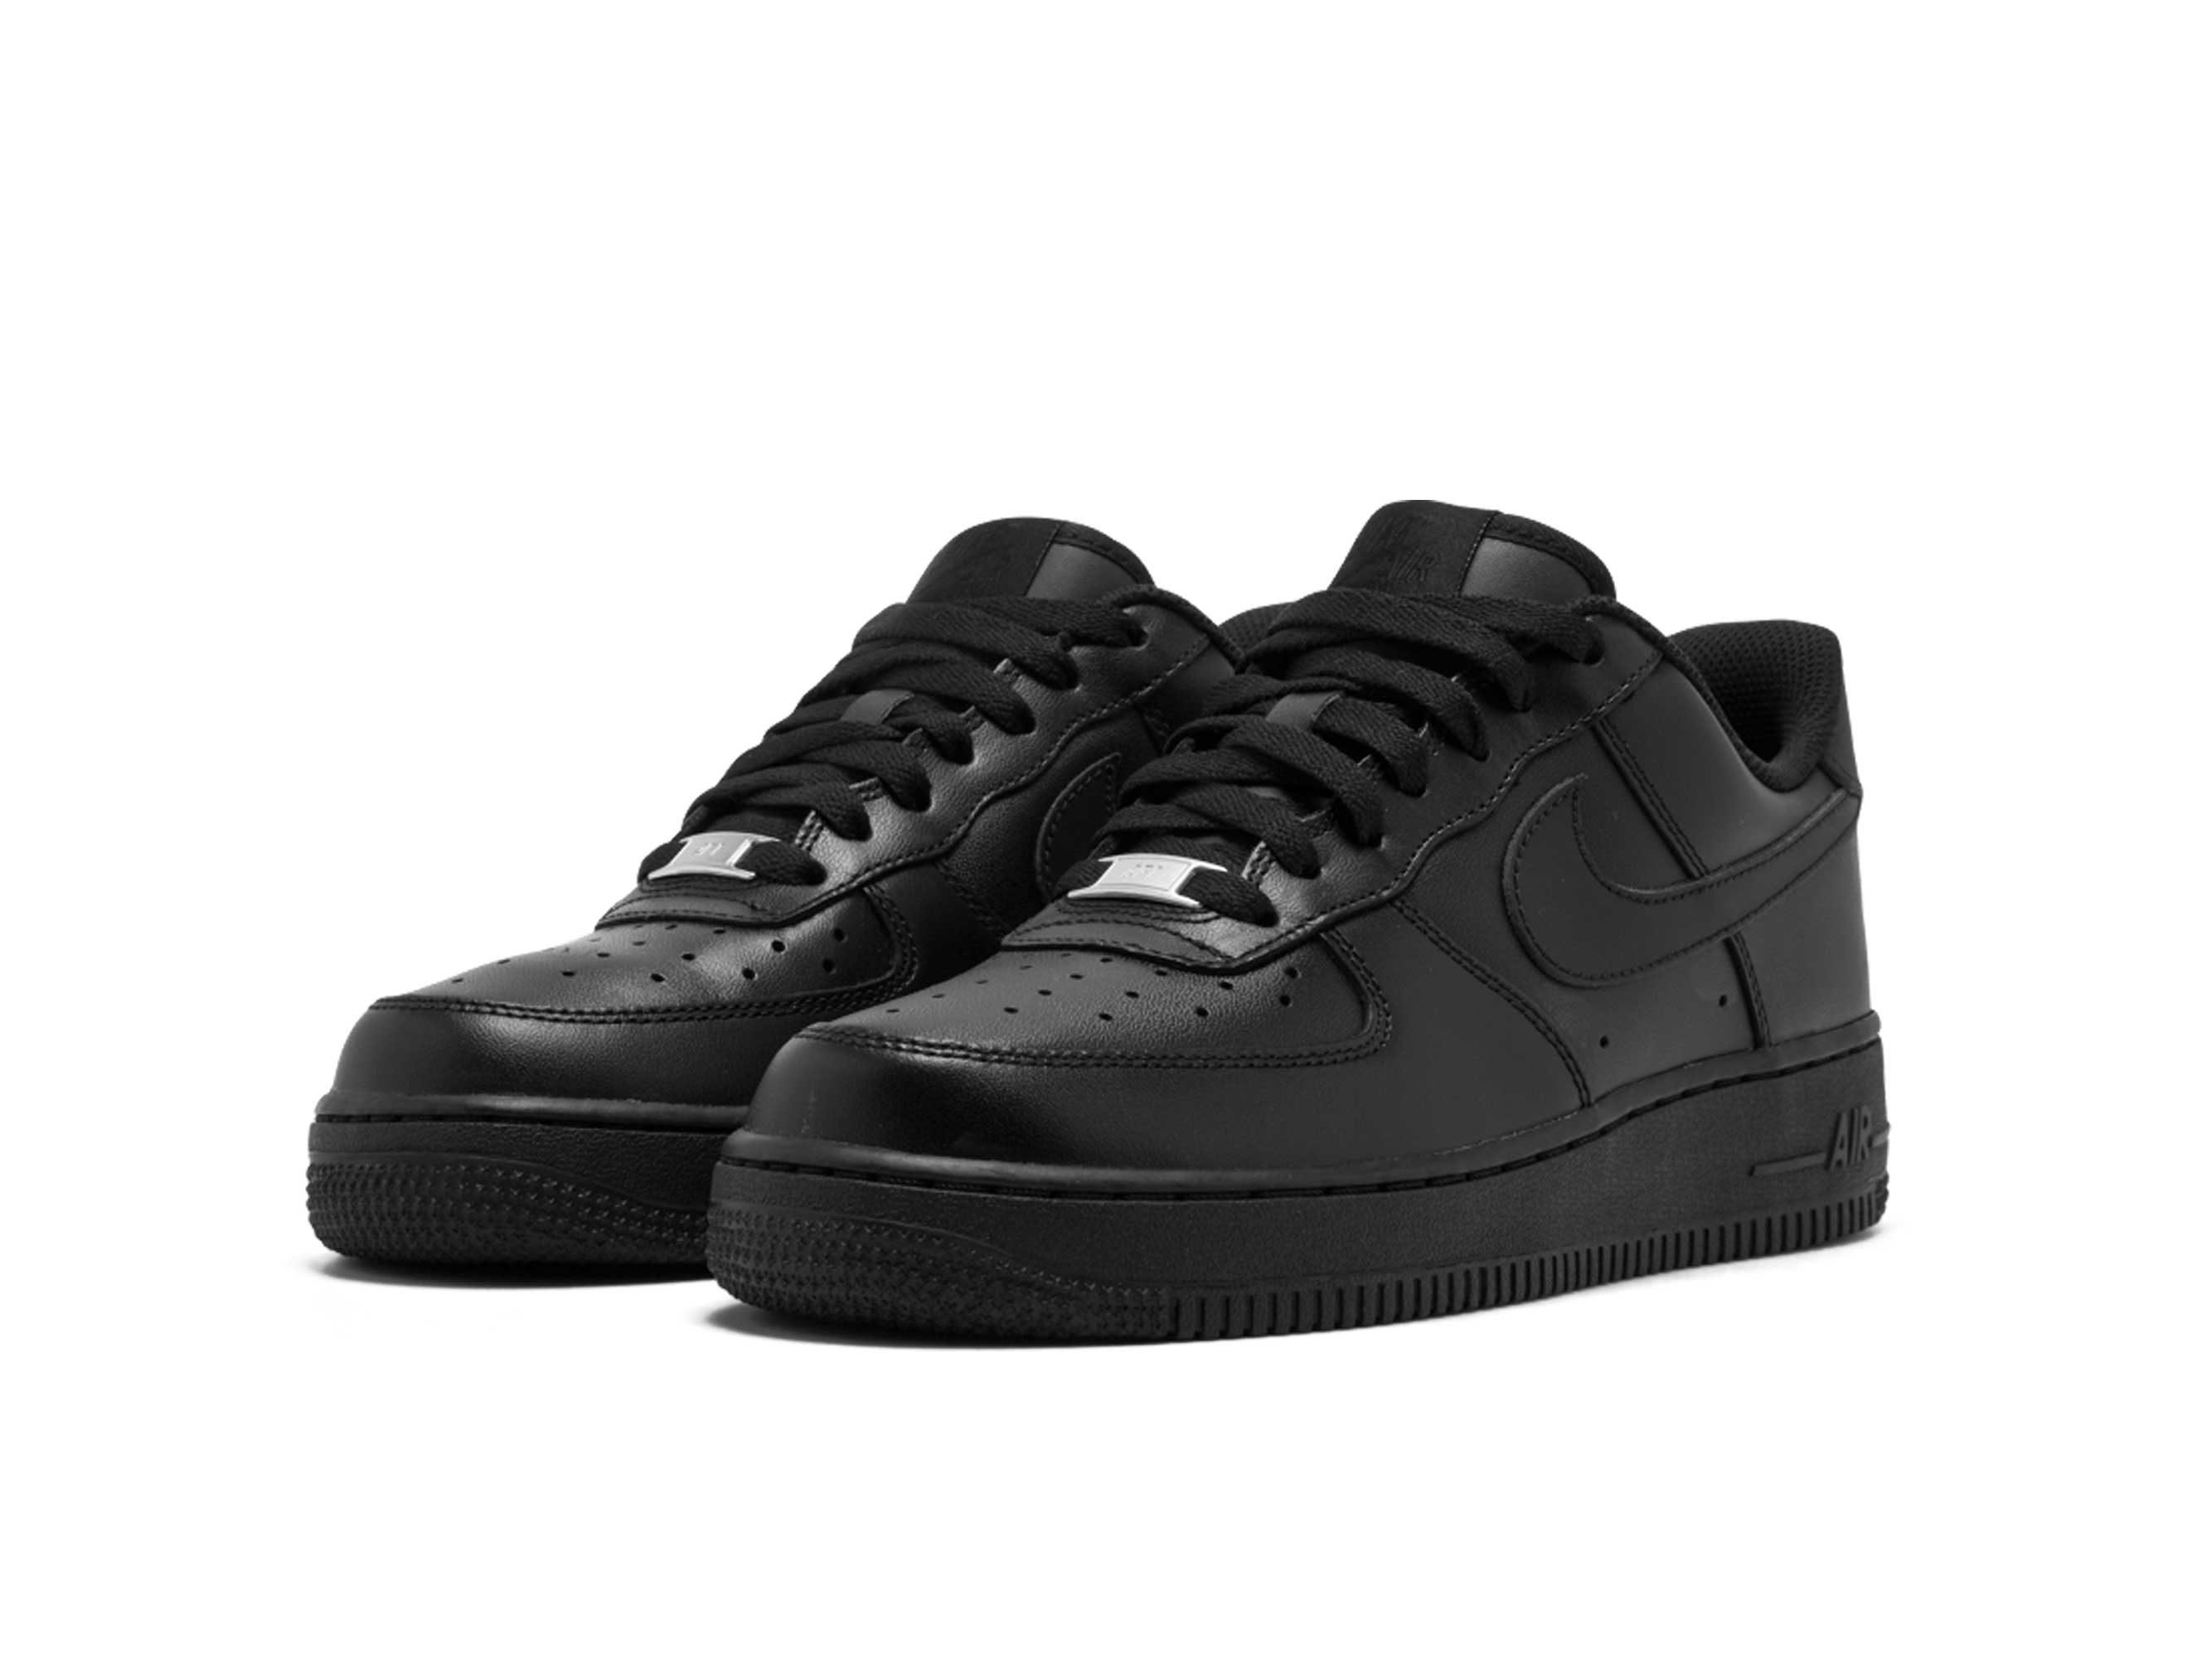 nike air force 1 low black 355115_038 купить